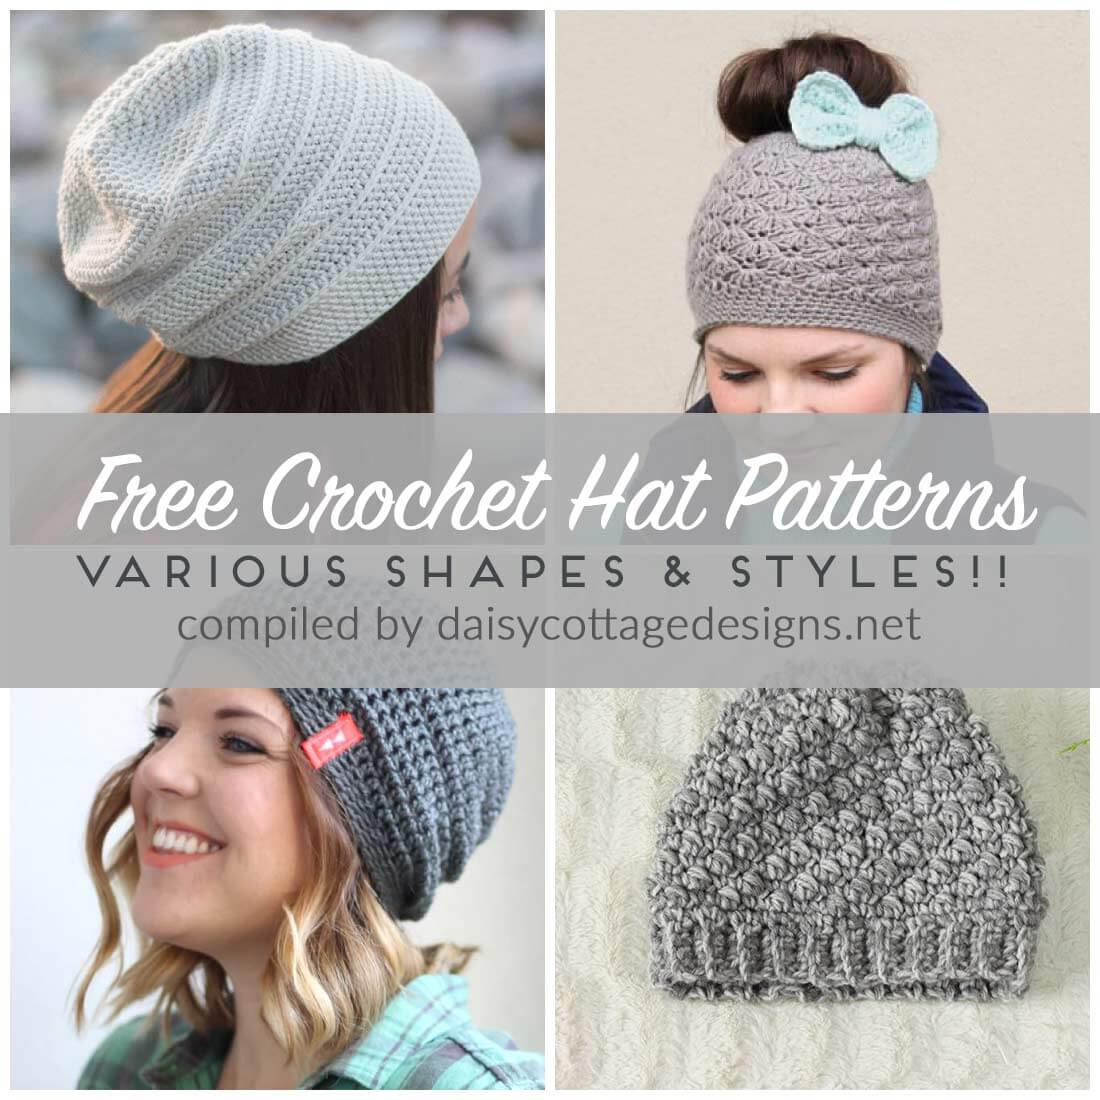 Crochet Patterns Free Free Crochet Hat Patterns Daisy Cottage Designs